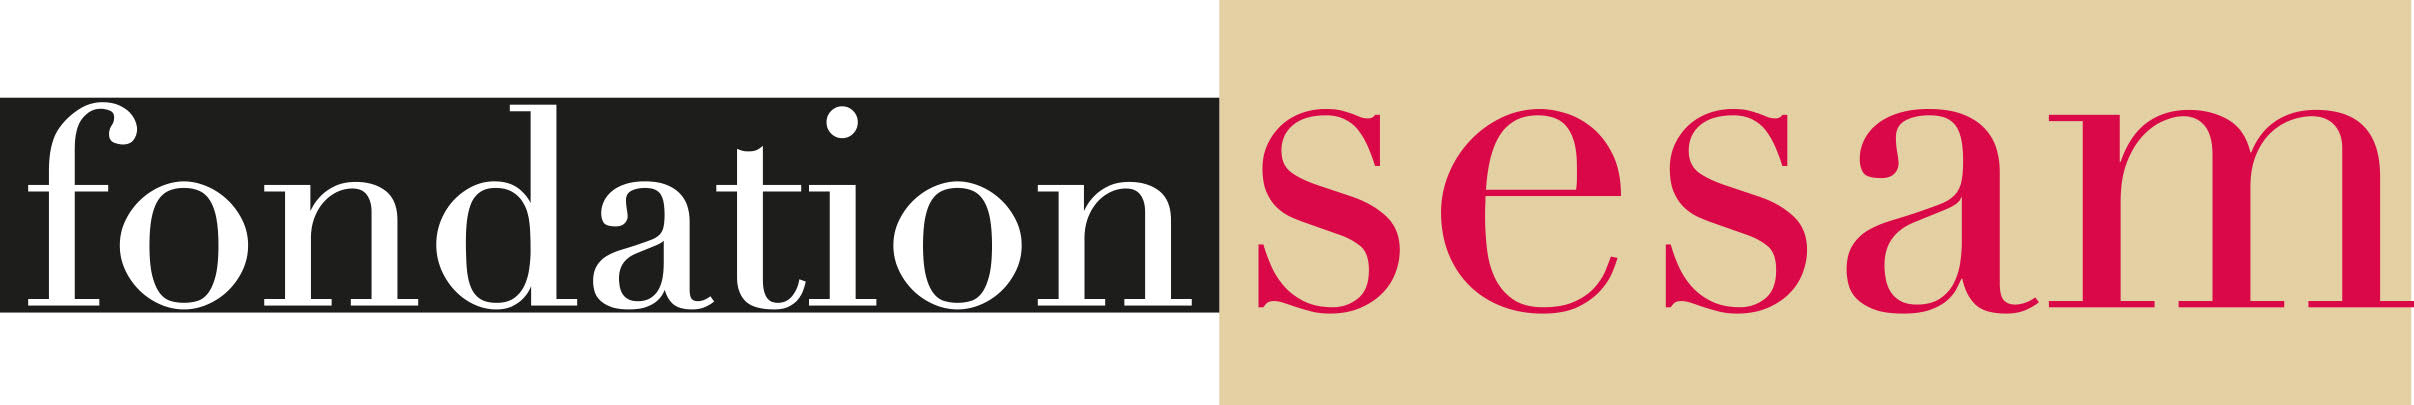 fondation sesam.jpg